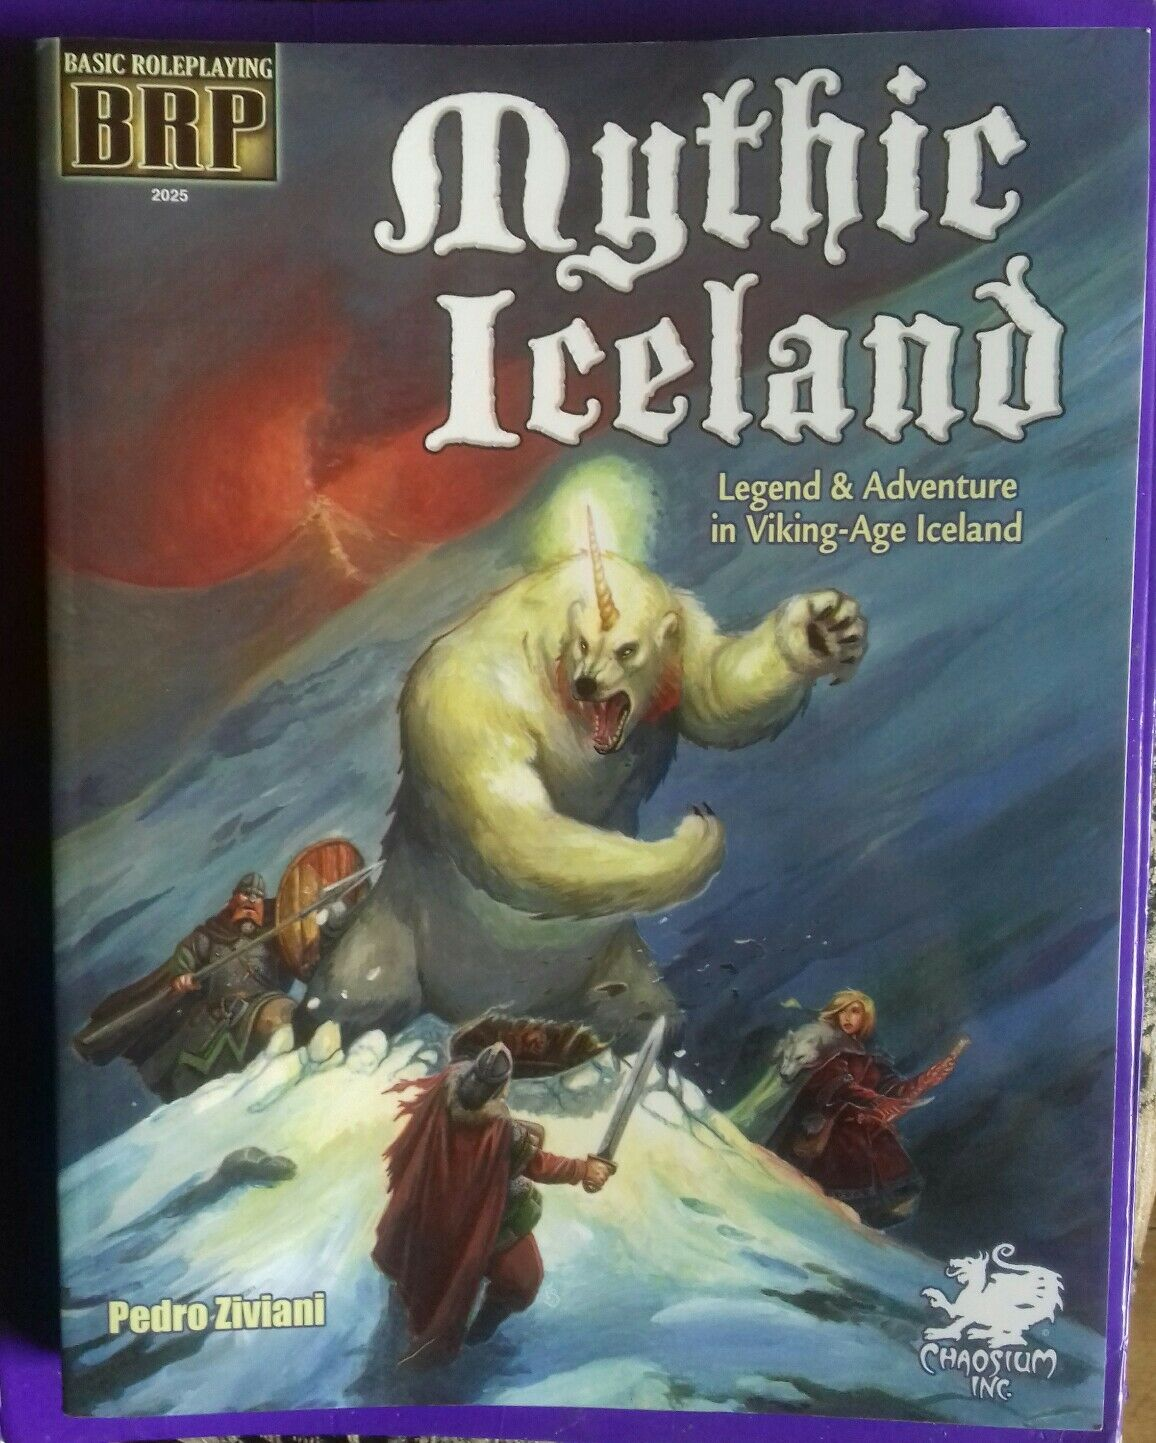 Mythic Iceland chaosium fantasy BRP RPG basic roleplaying book